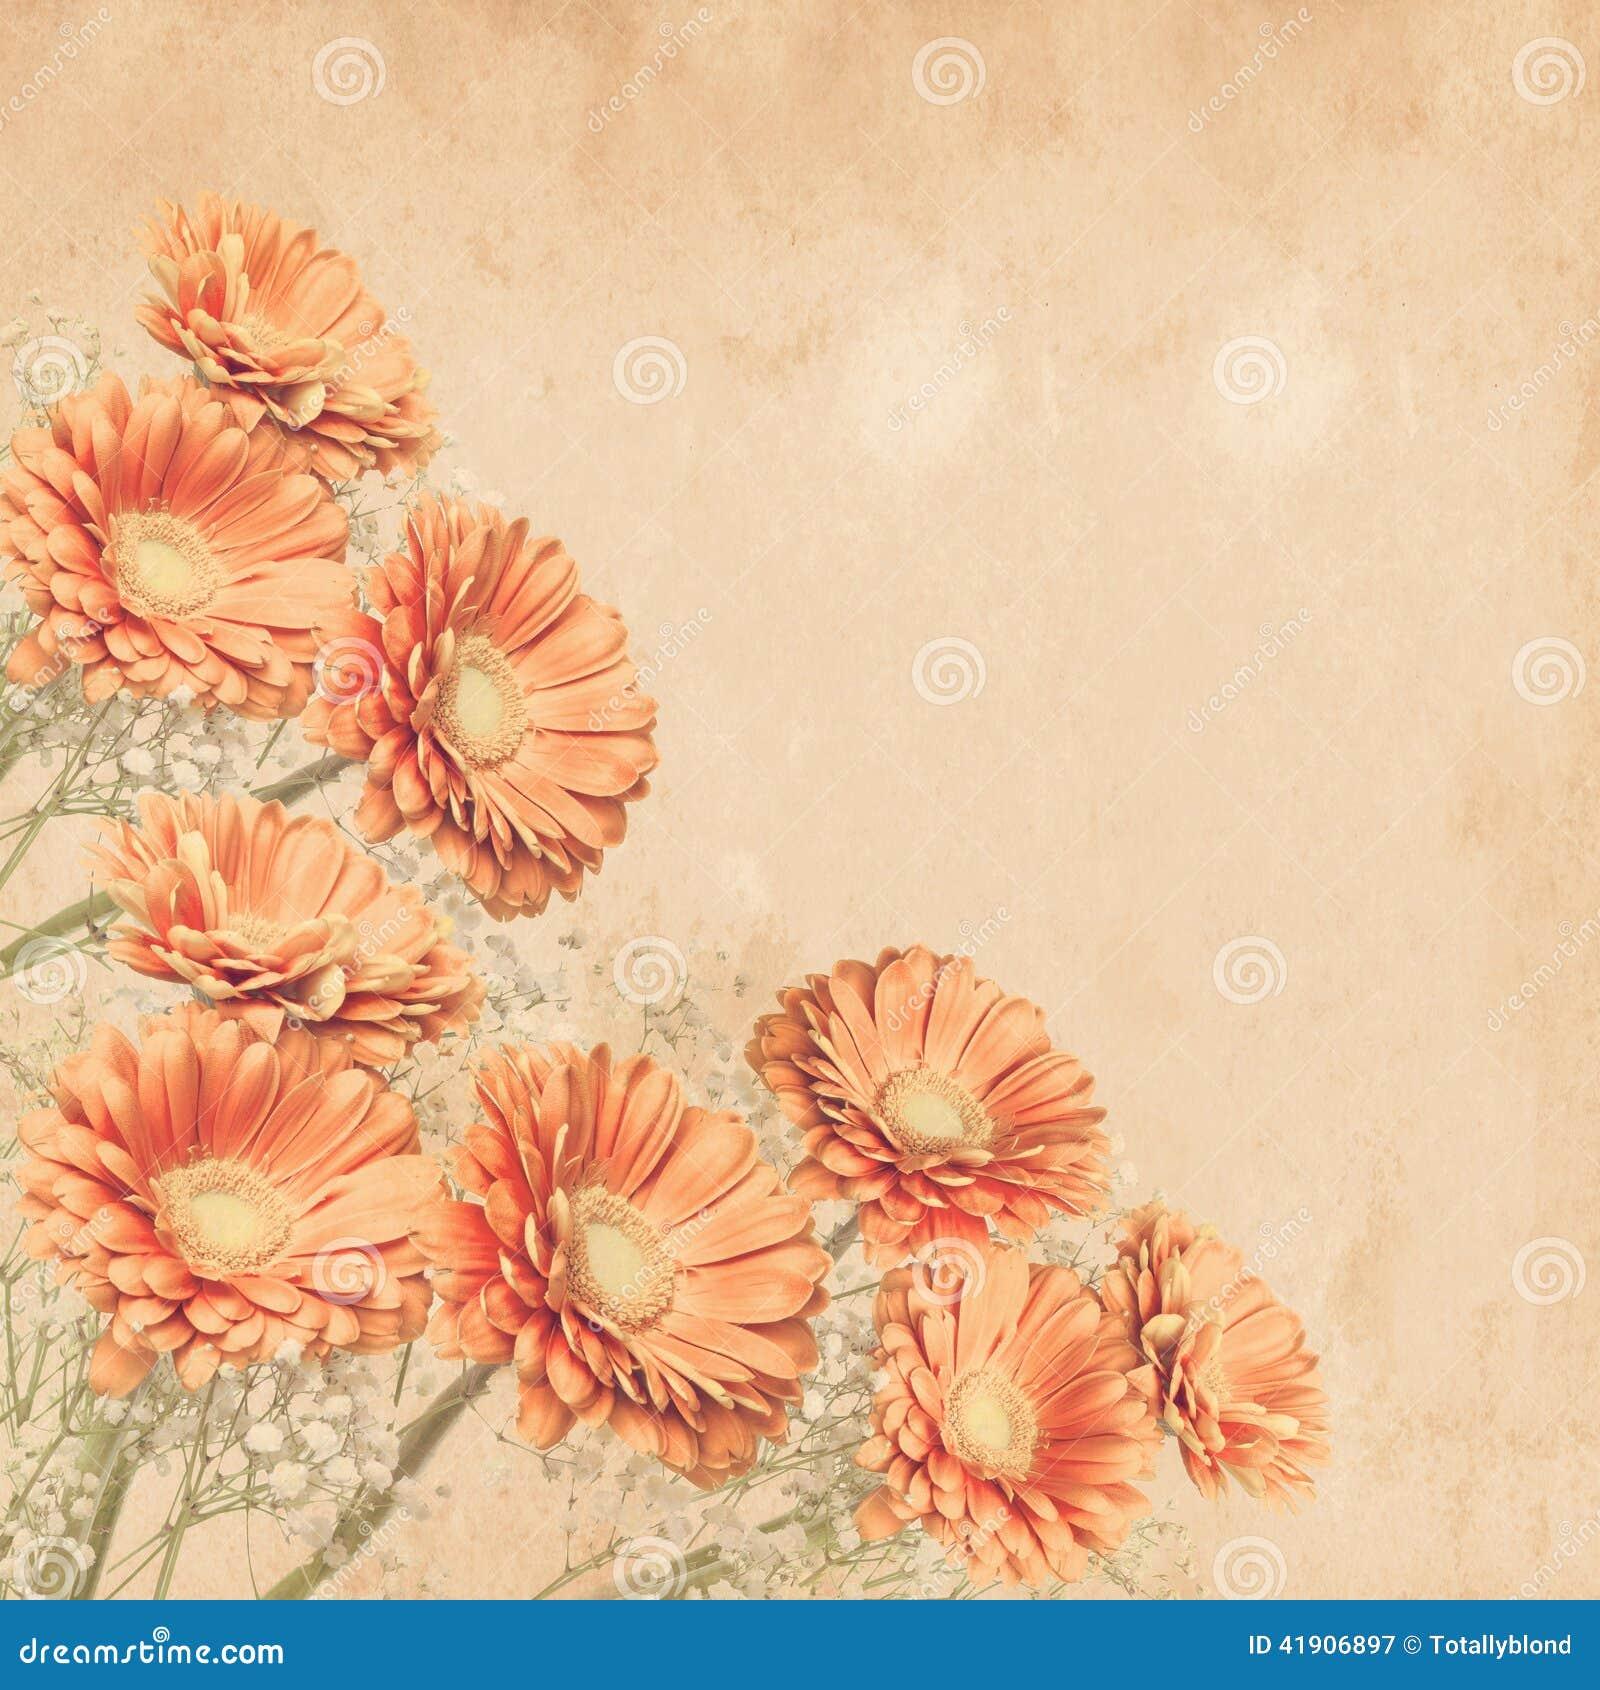 summer flower retro sunshine - photo #22